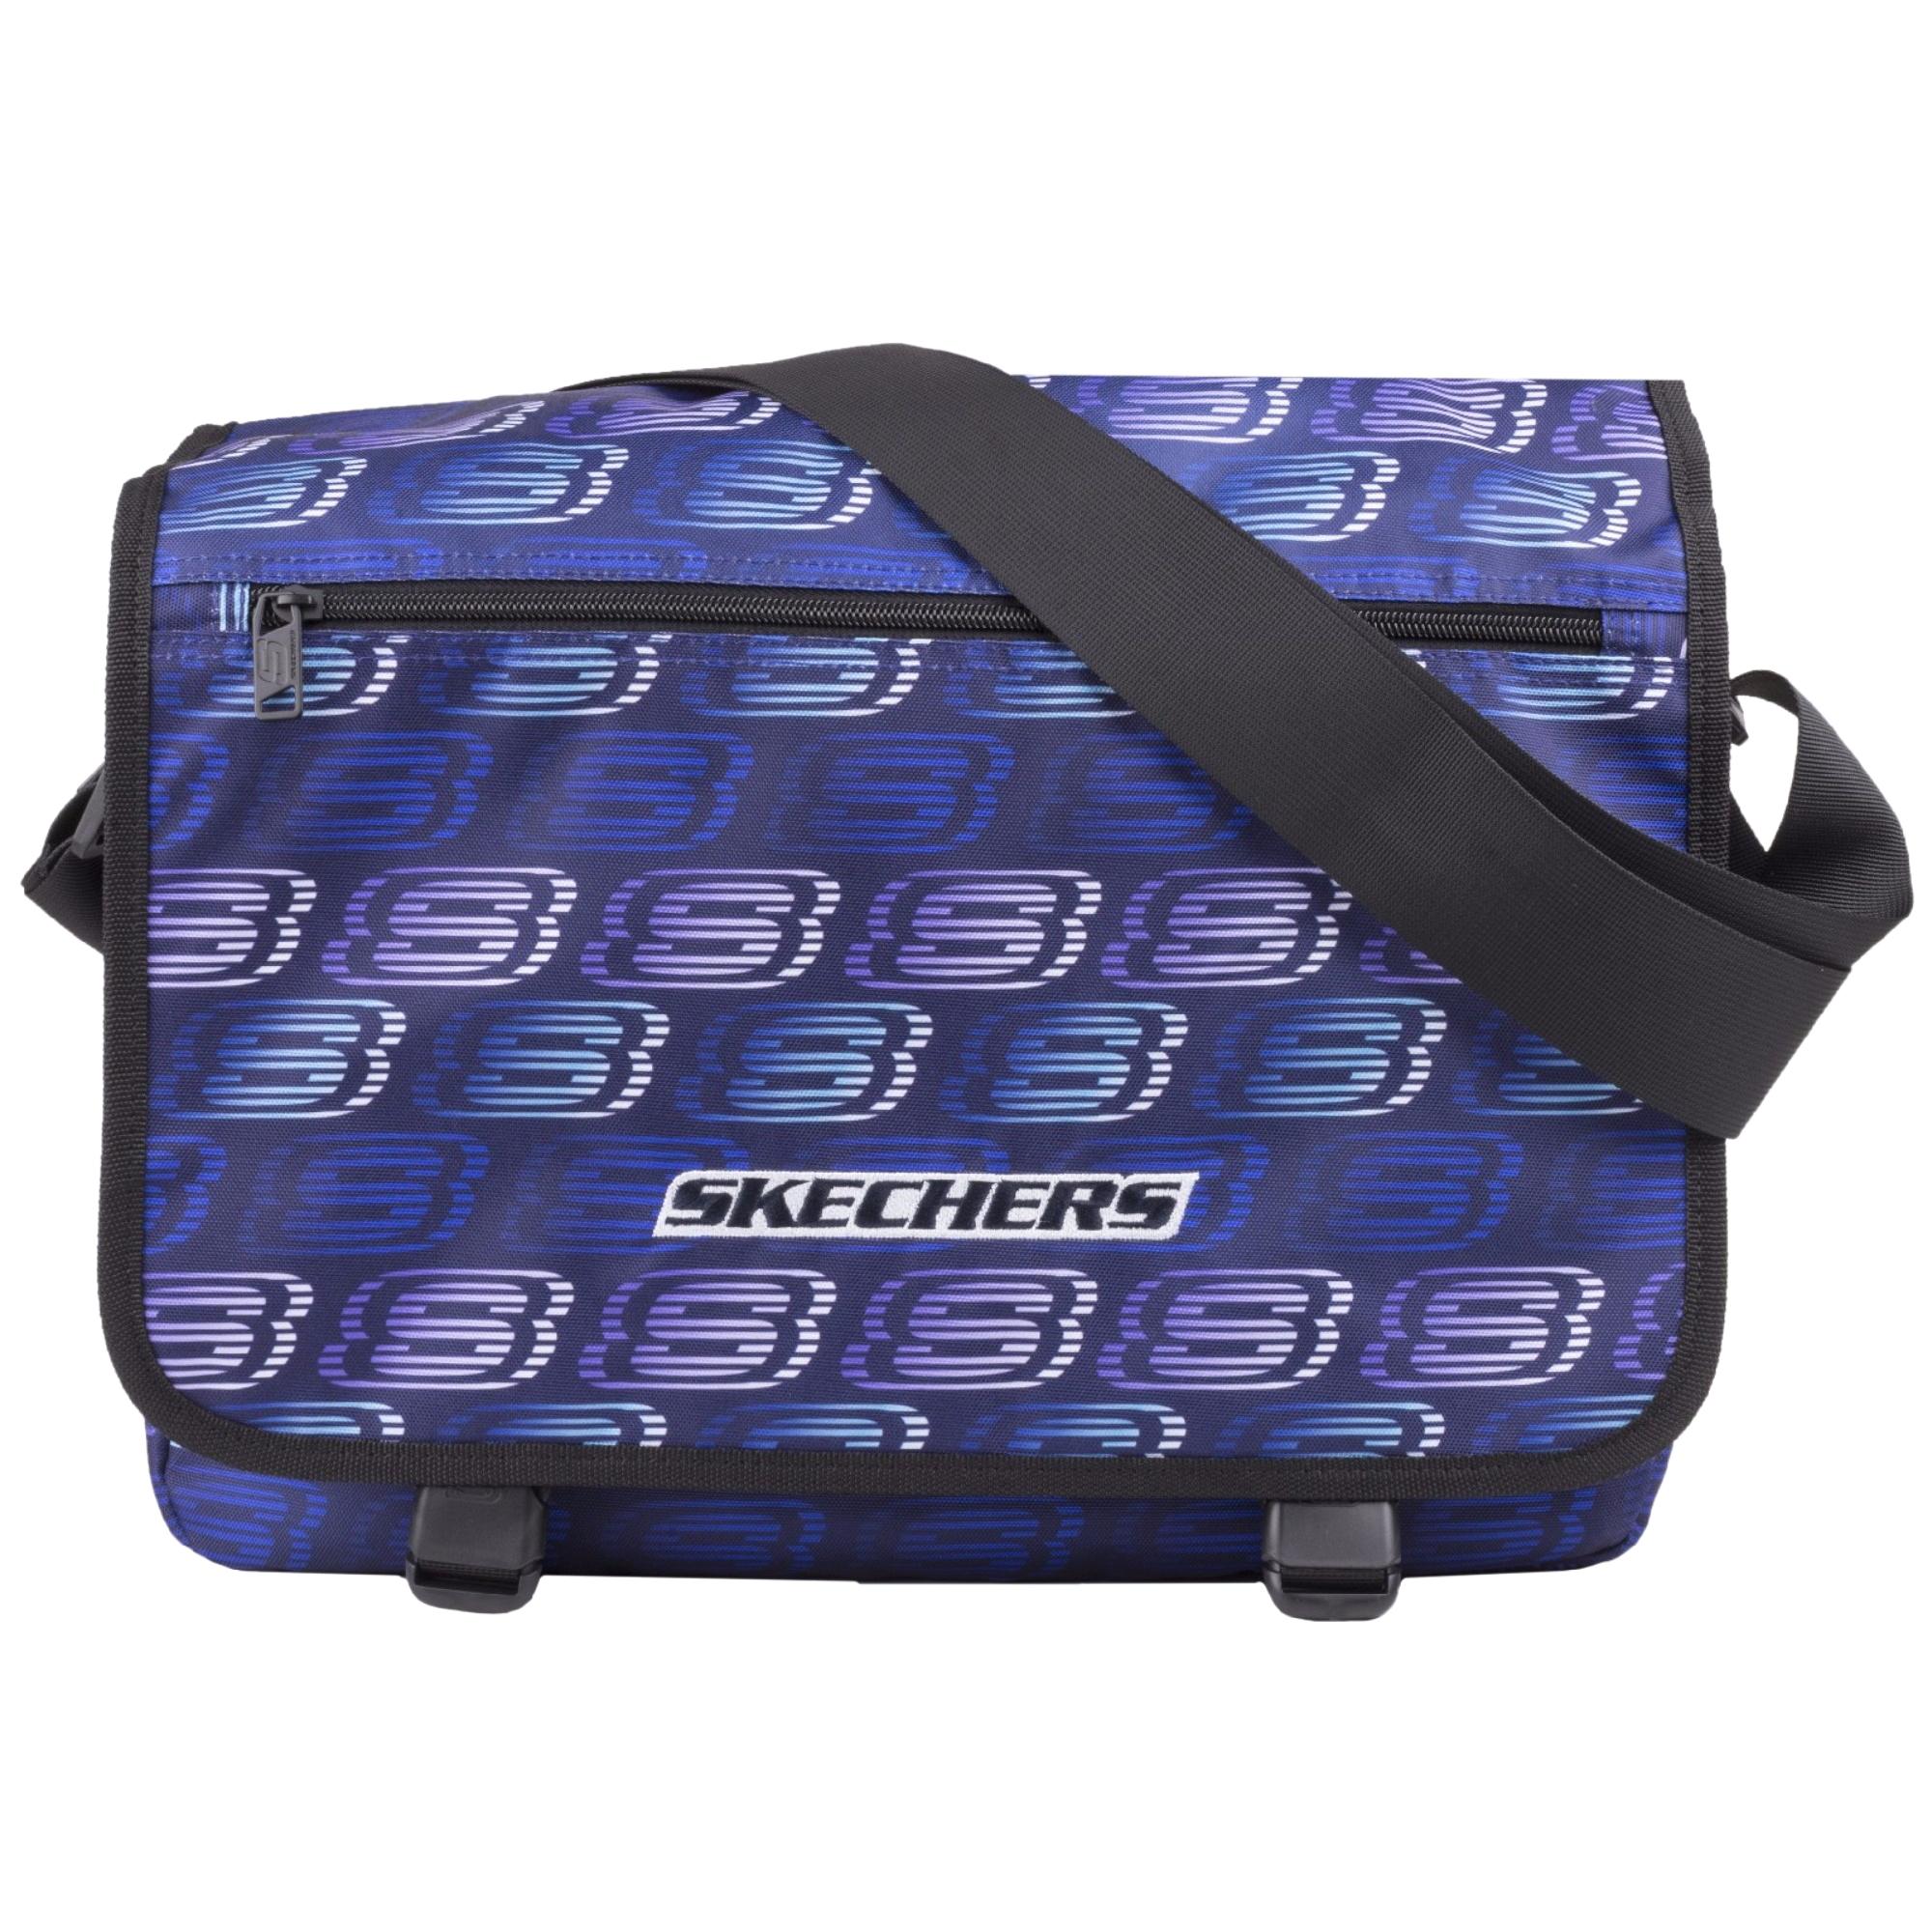 Skechers-Mochila-bandolera-modelo-Original-Unisex-FS4163